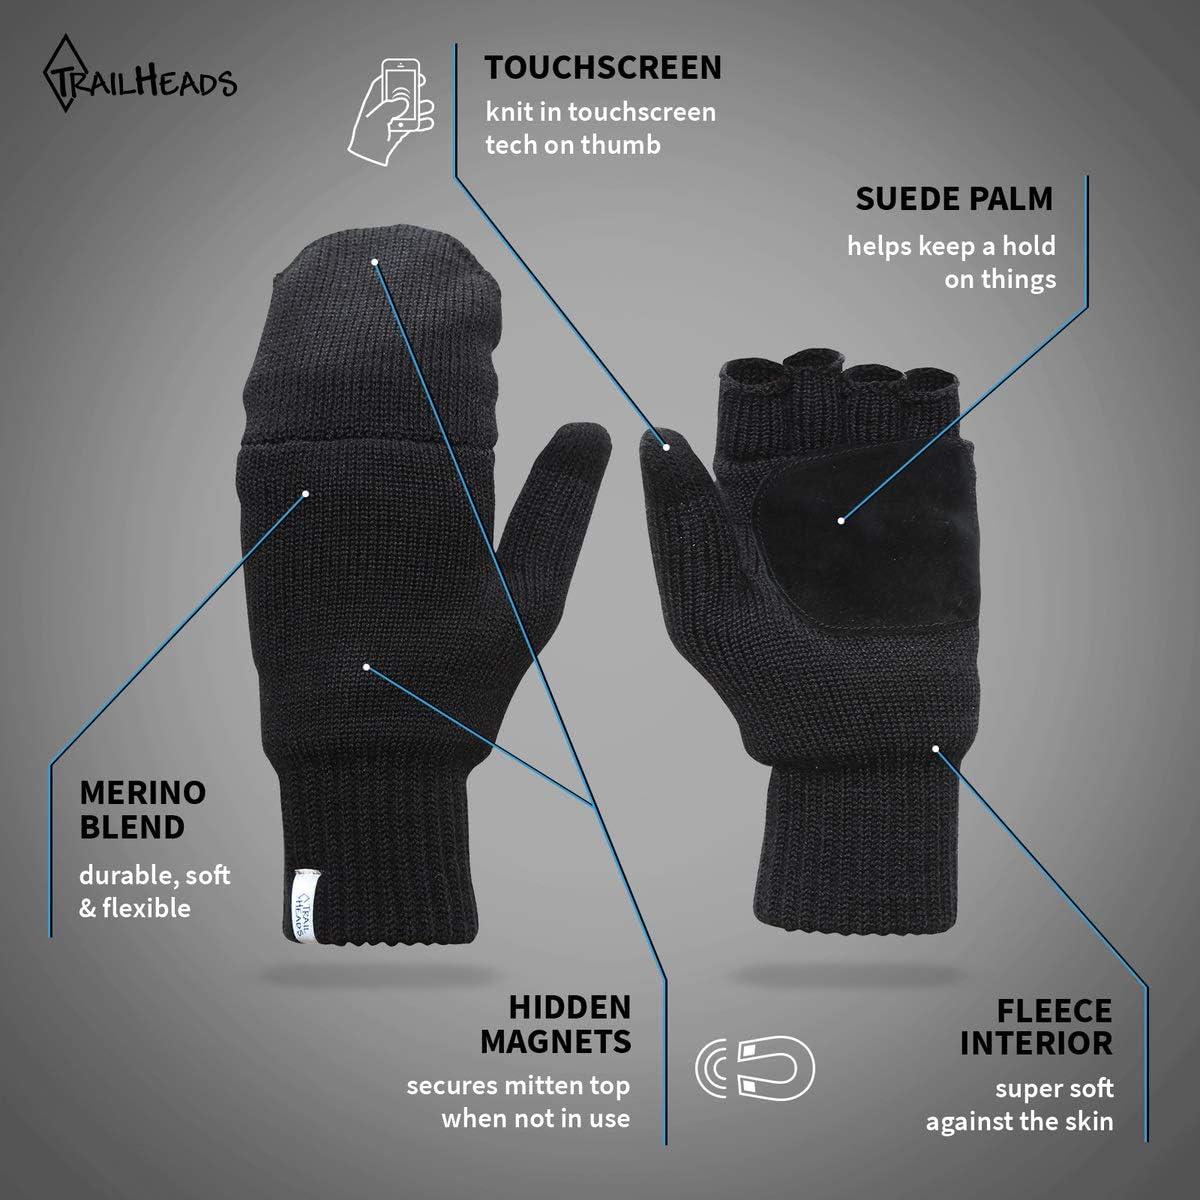 TrailHeads Women's Fingerless Gloves   Merino Knit Convertible Mittens